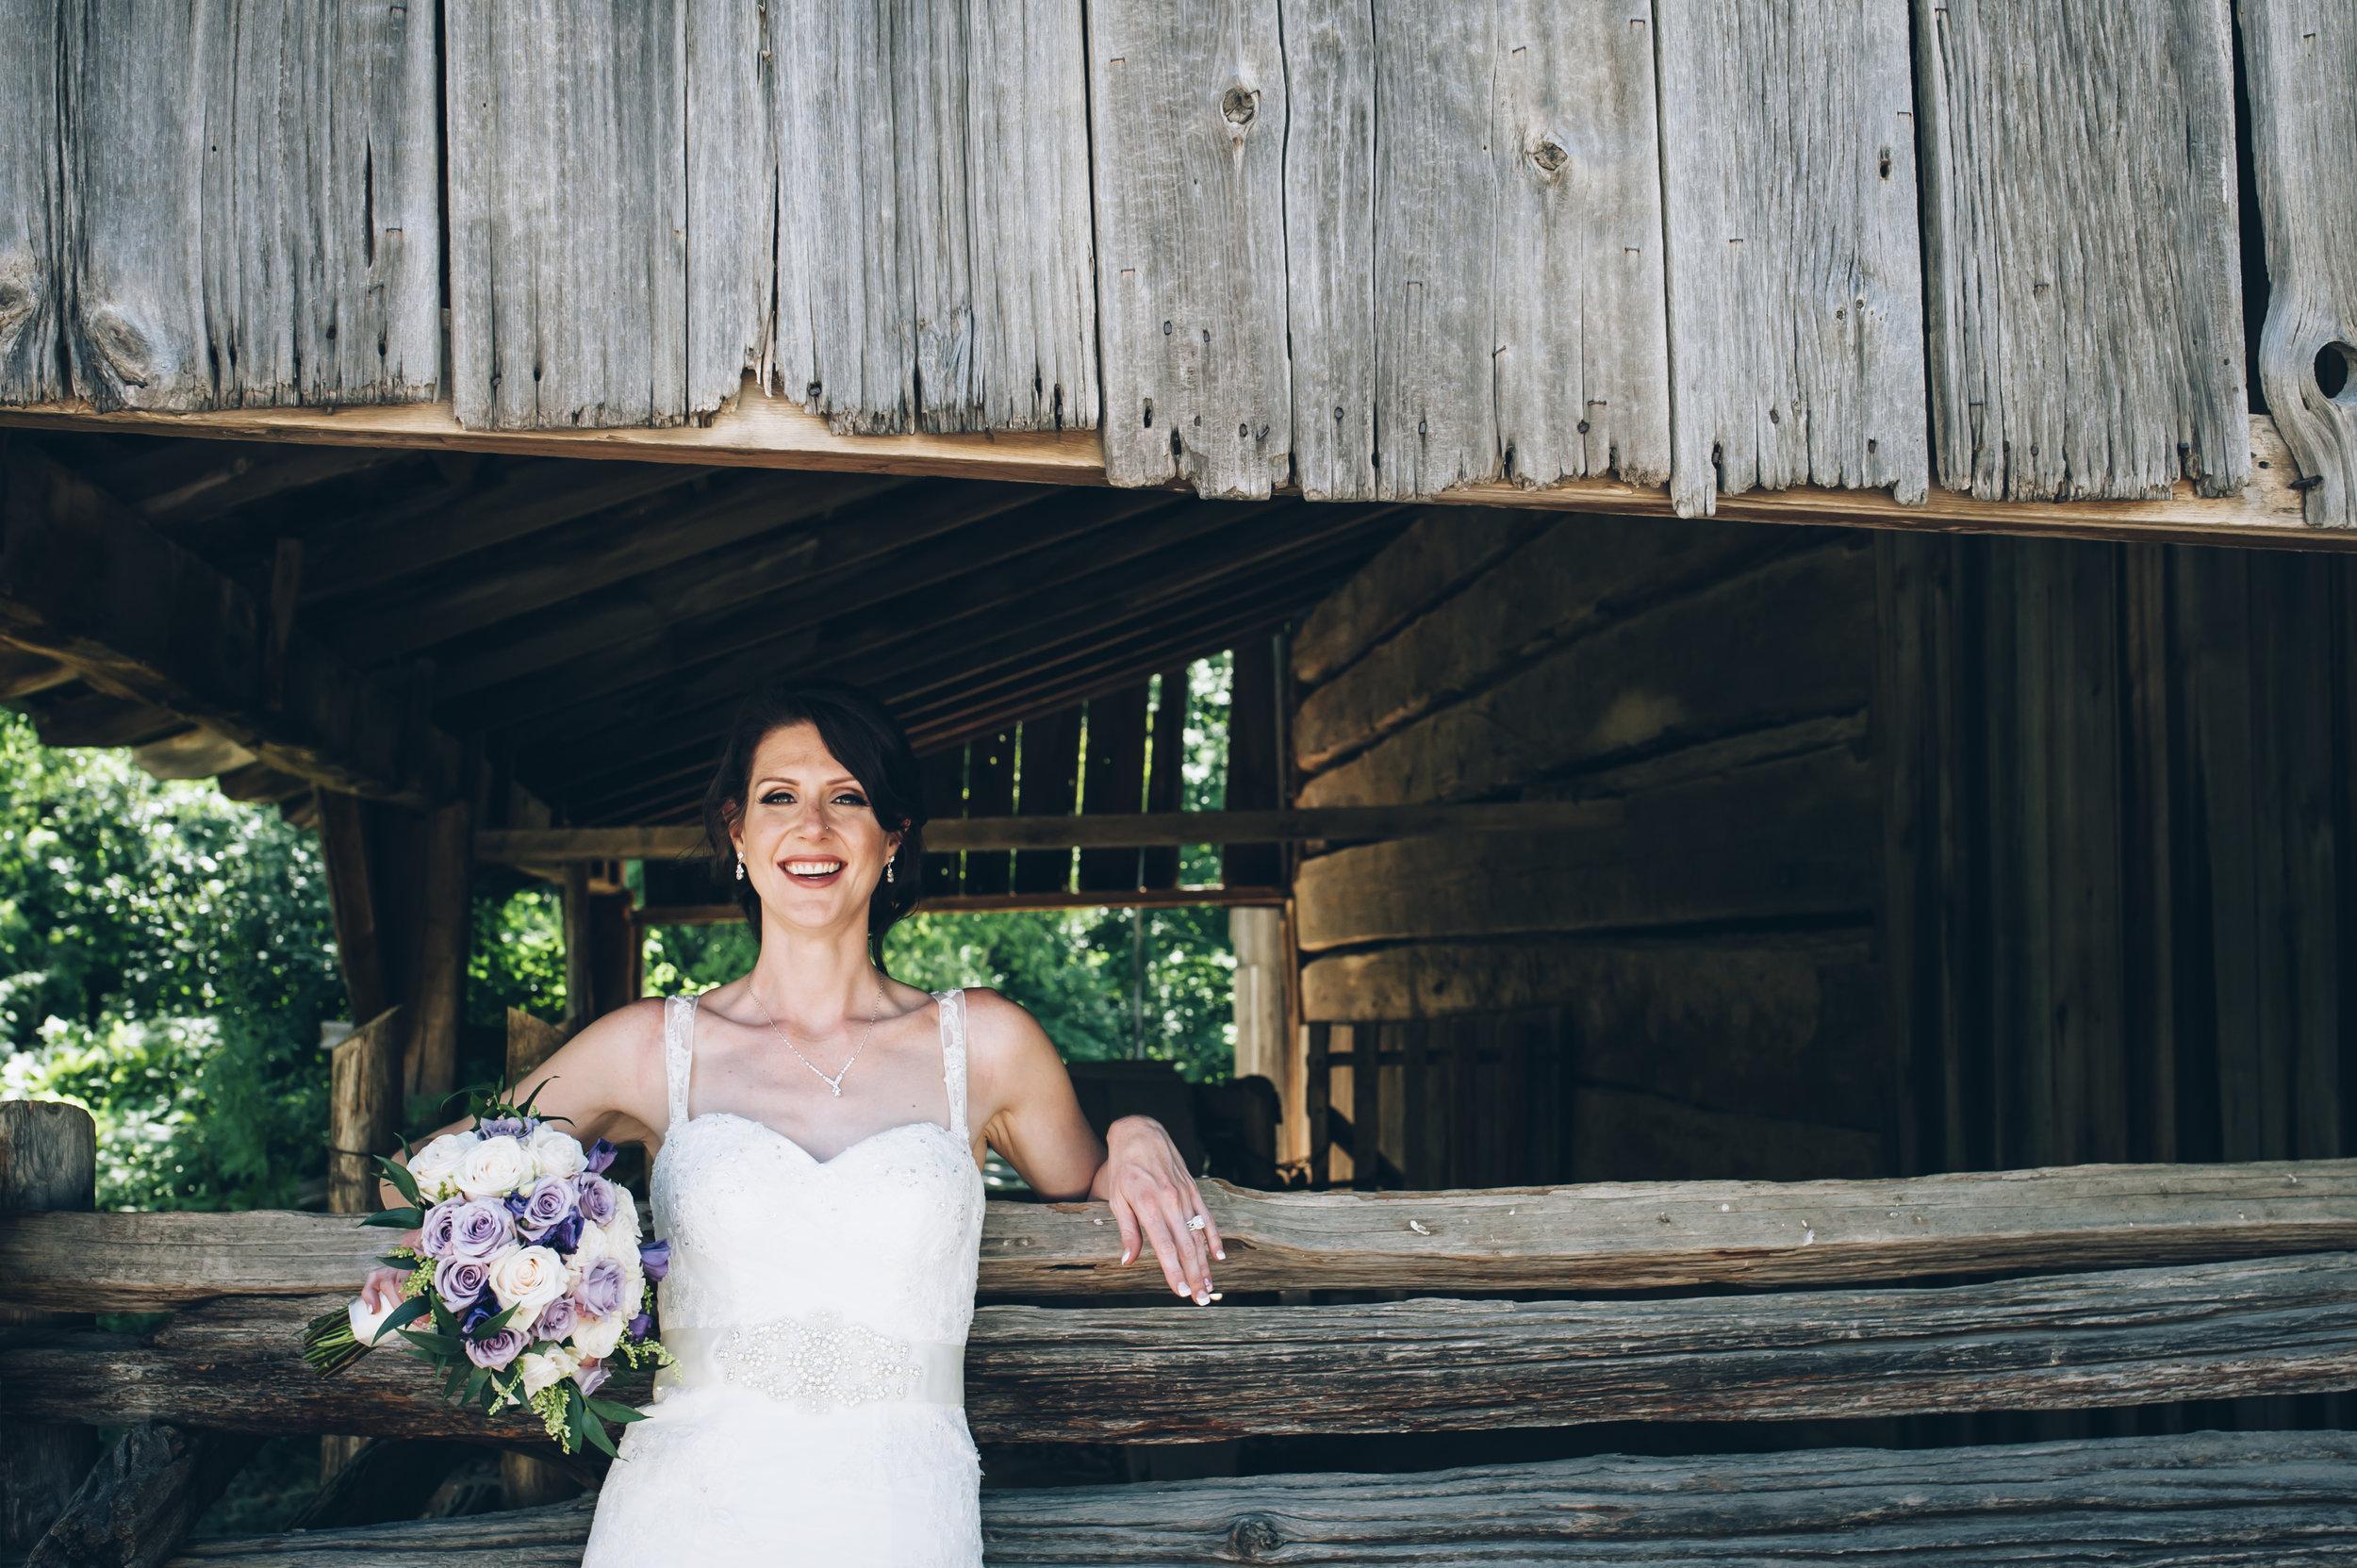 wedding, wedding photographer,love,Burlington wedding photographer,bride